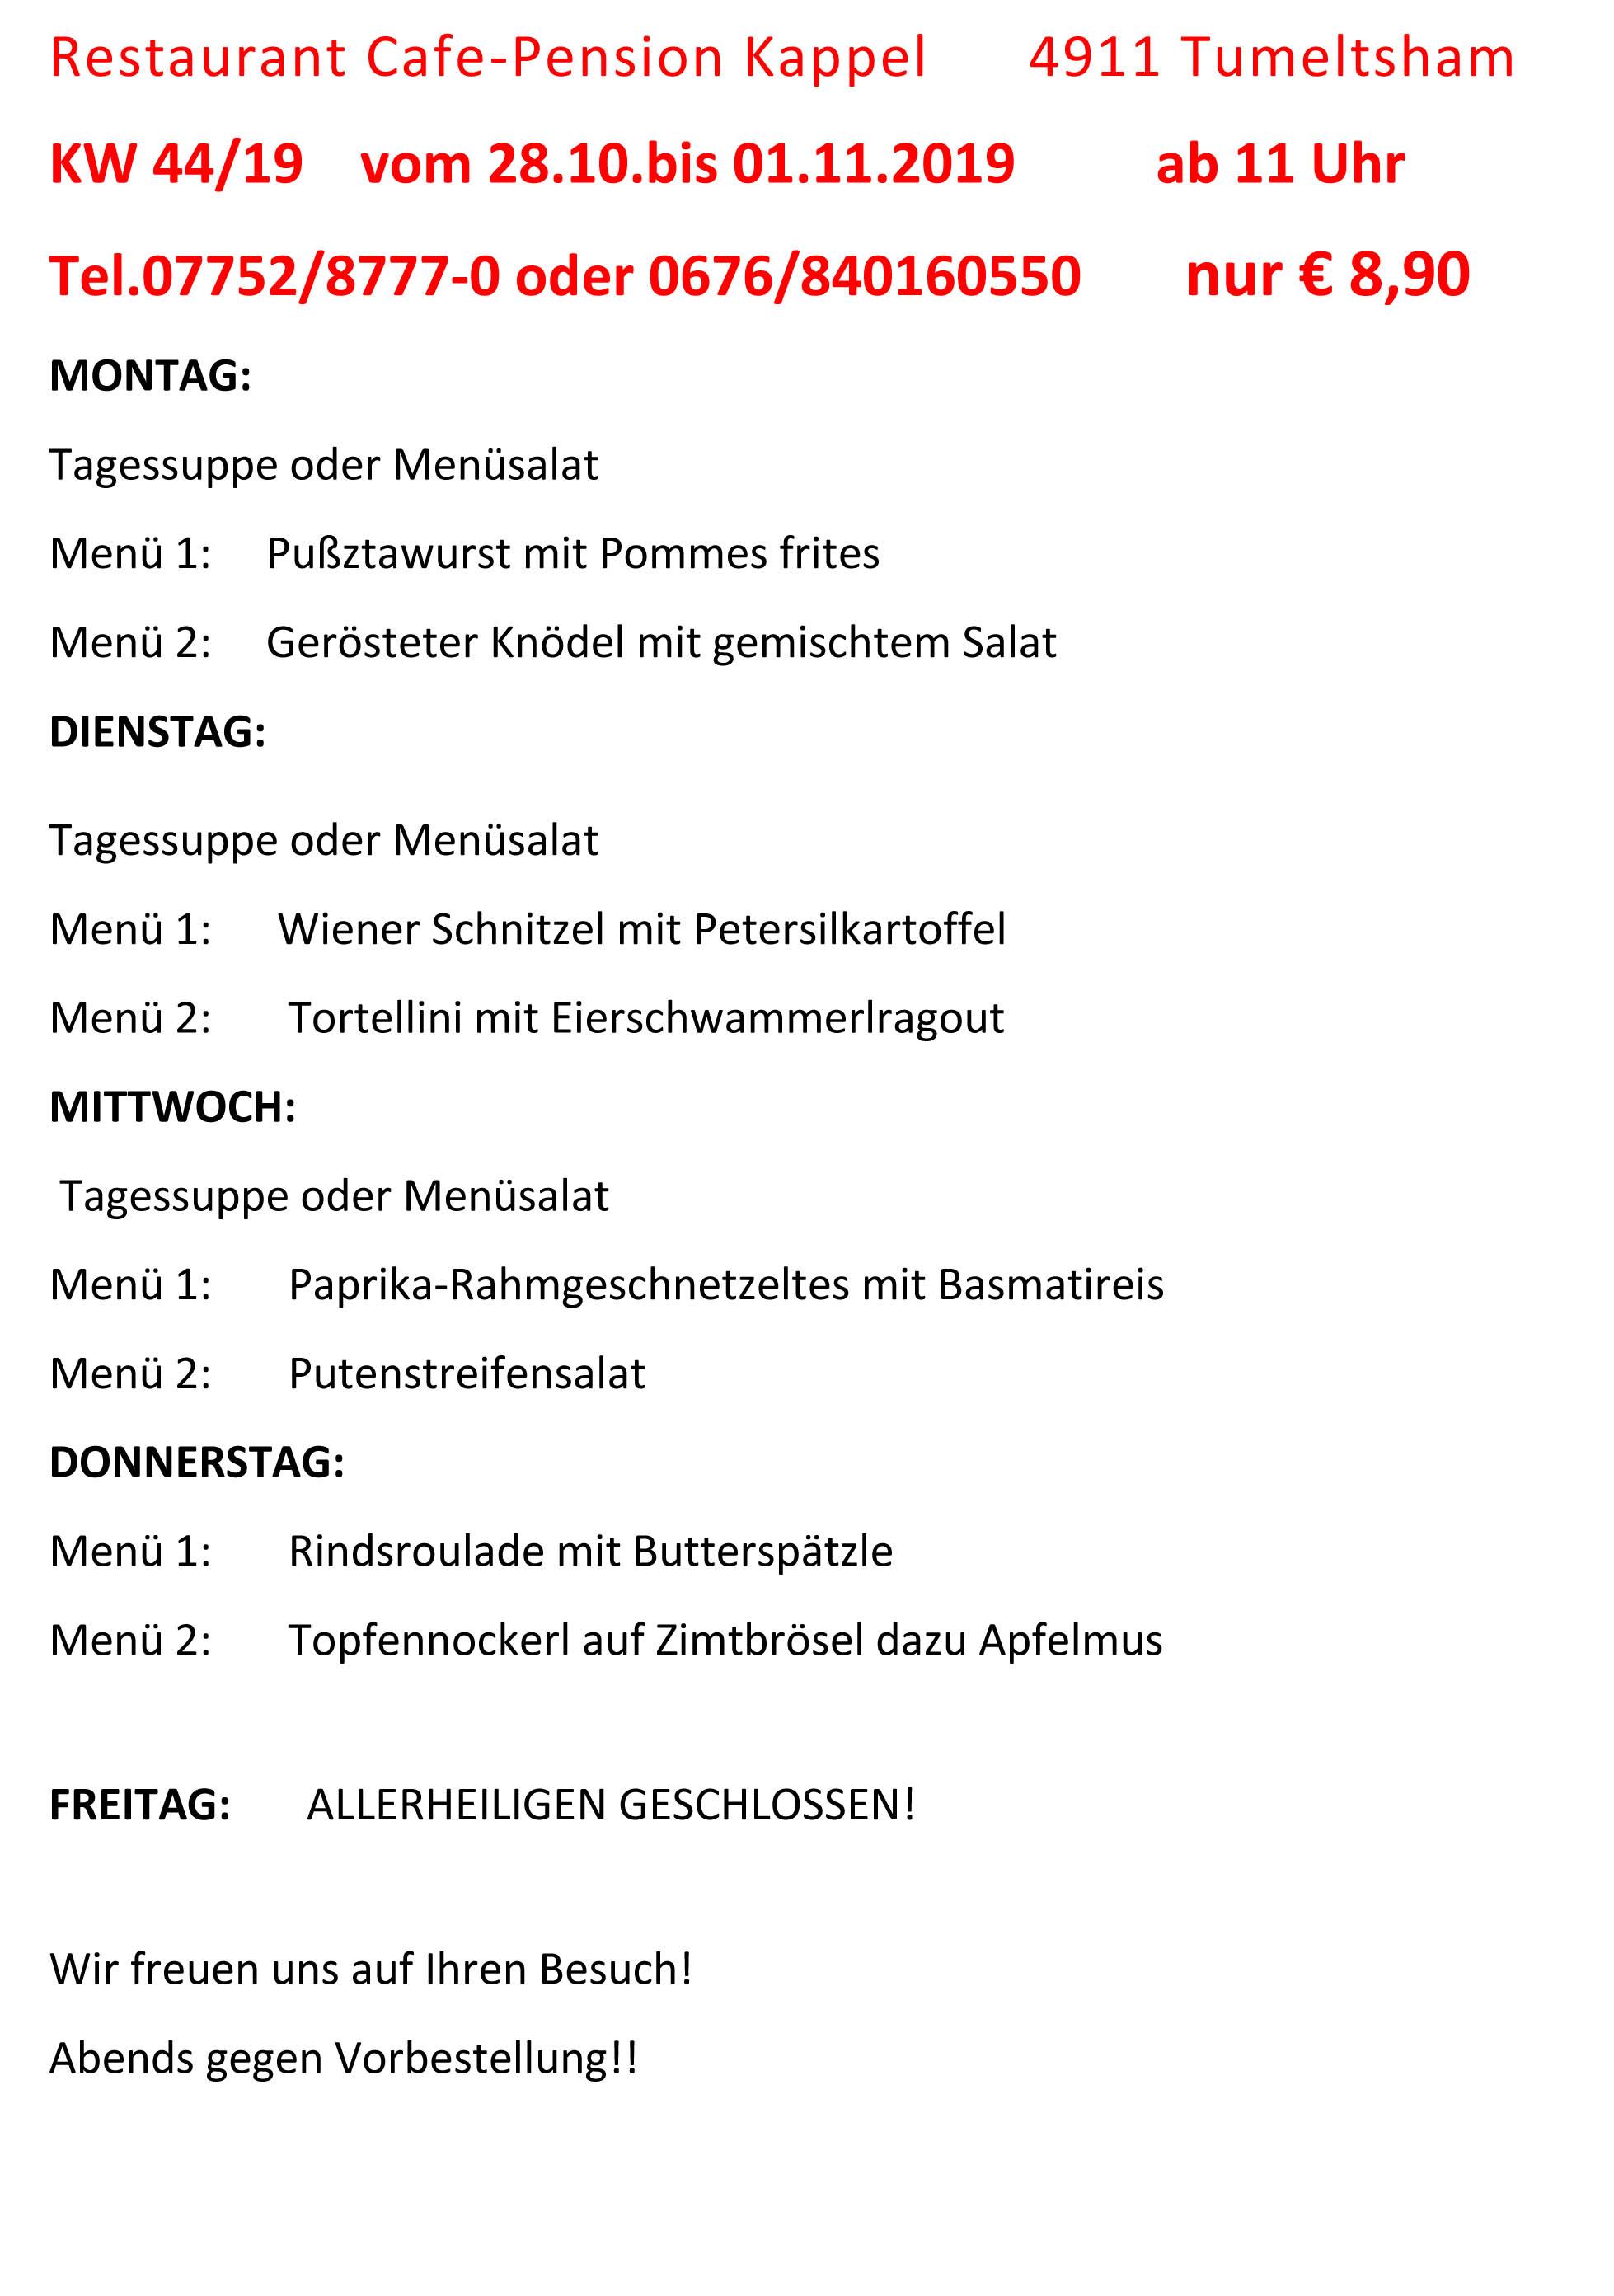 Menüplan KW 44-19 docx (1)